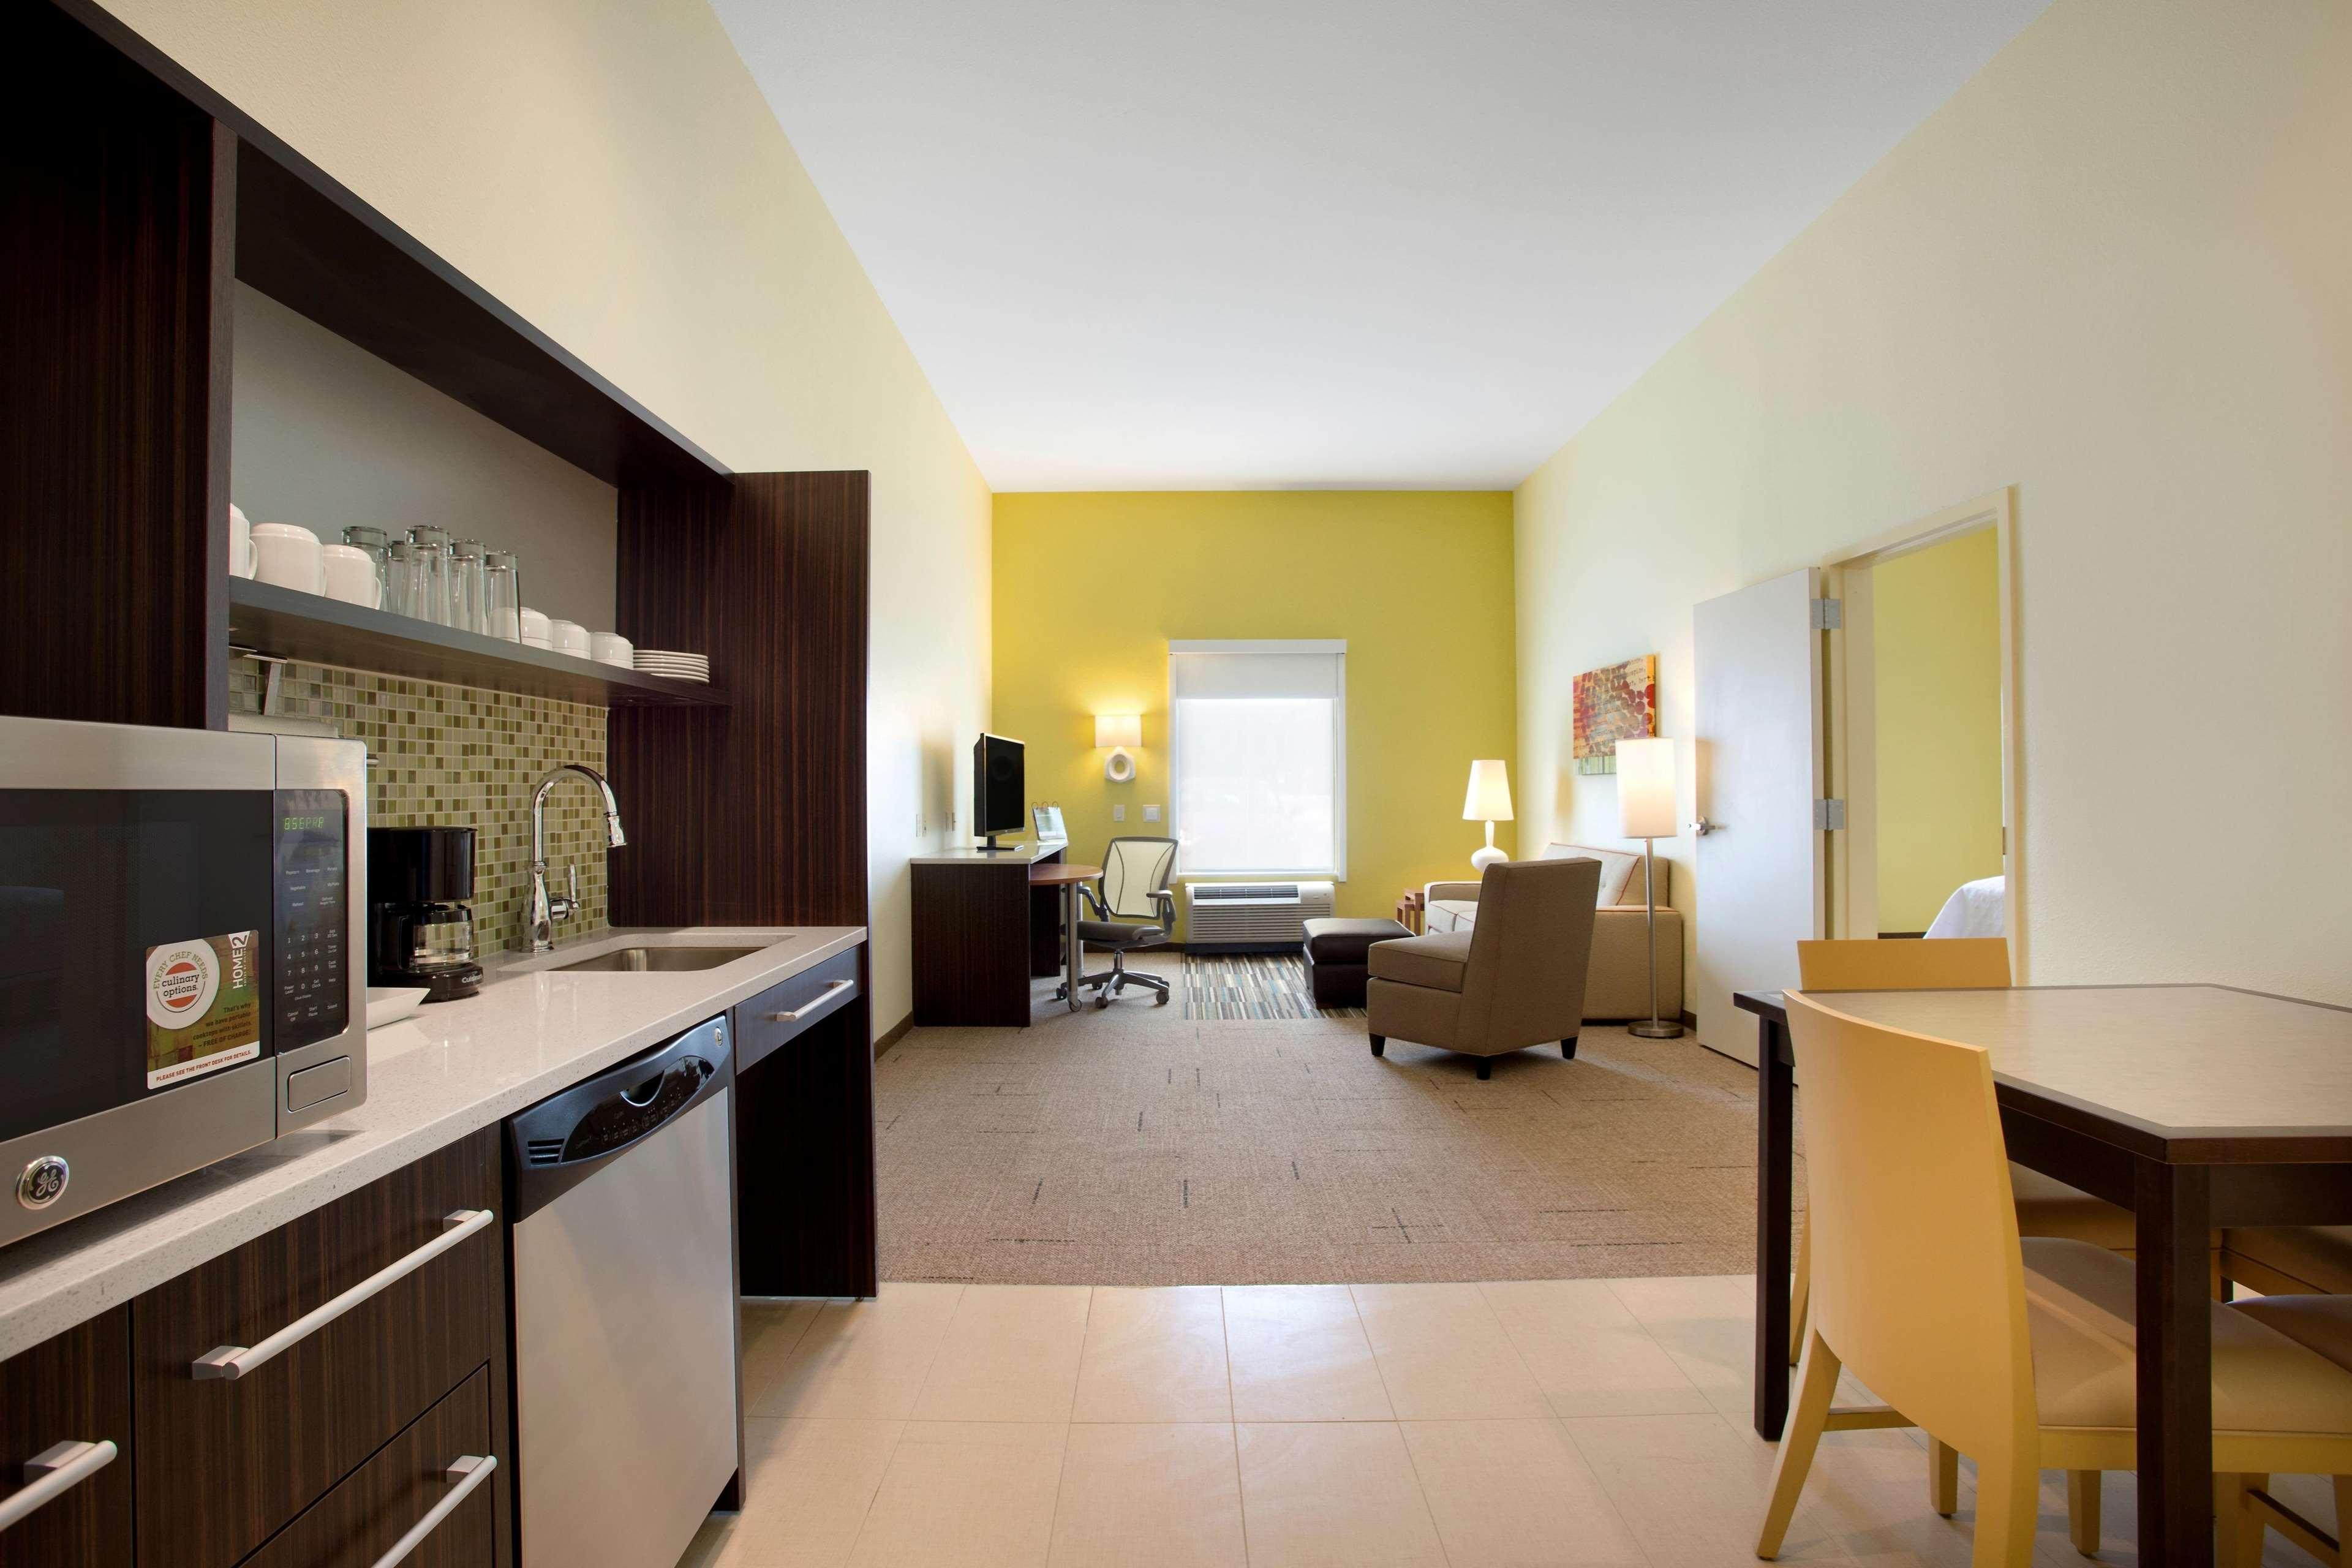 Home2 Suites by Hilton San Antonio Airport, TX image 21